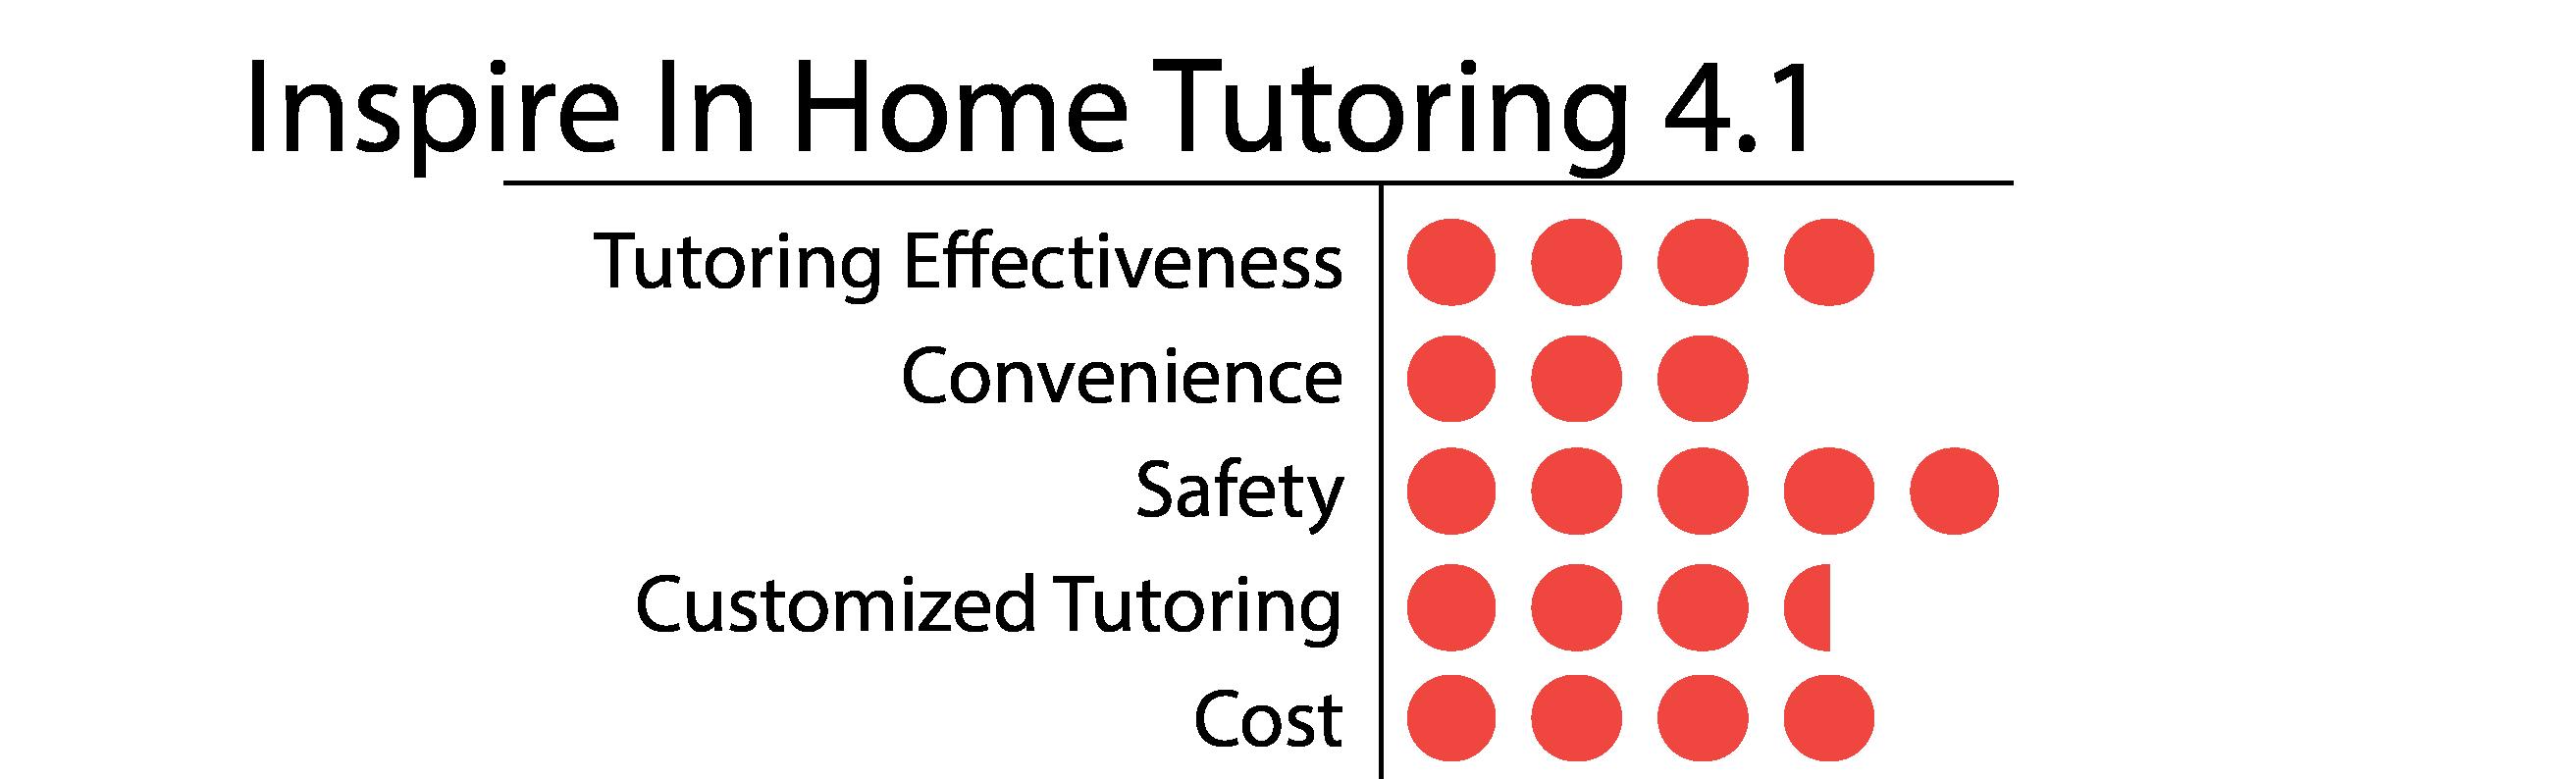 Inspire In Home Tutoring-01